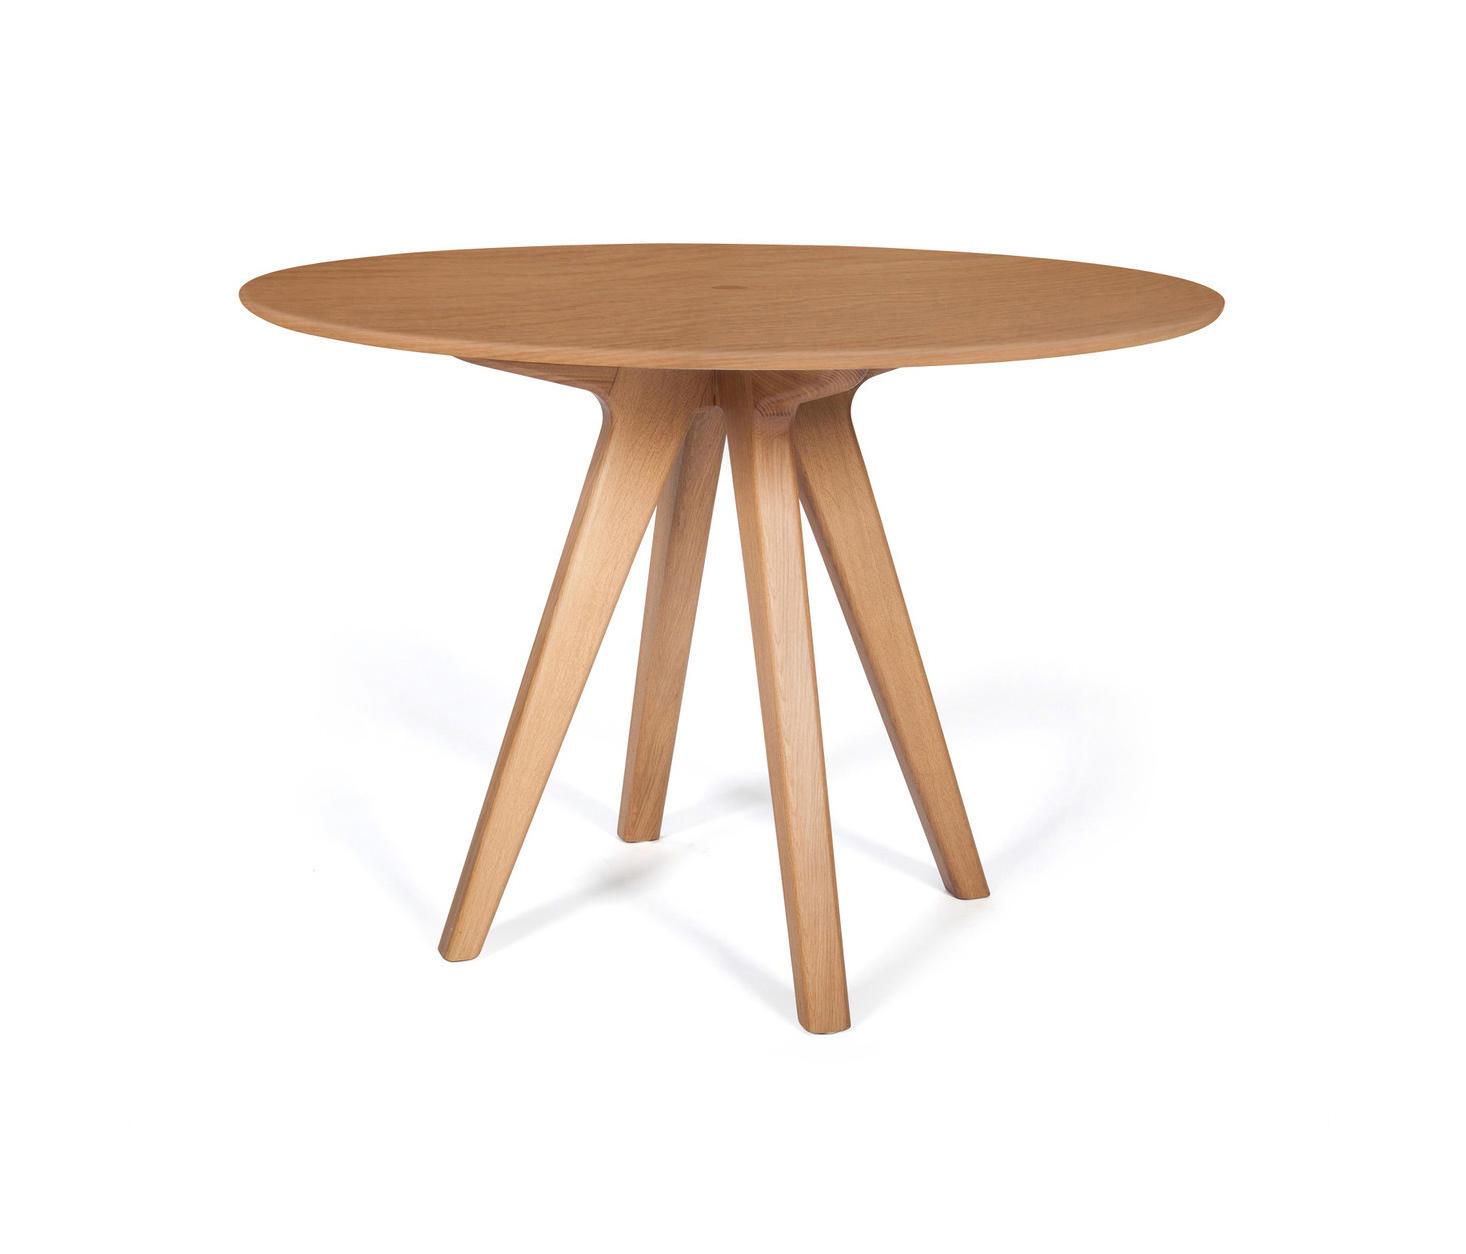 Arthur S Round Dining Table 30 Em Architonic